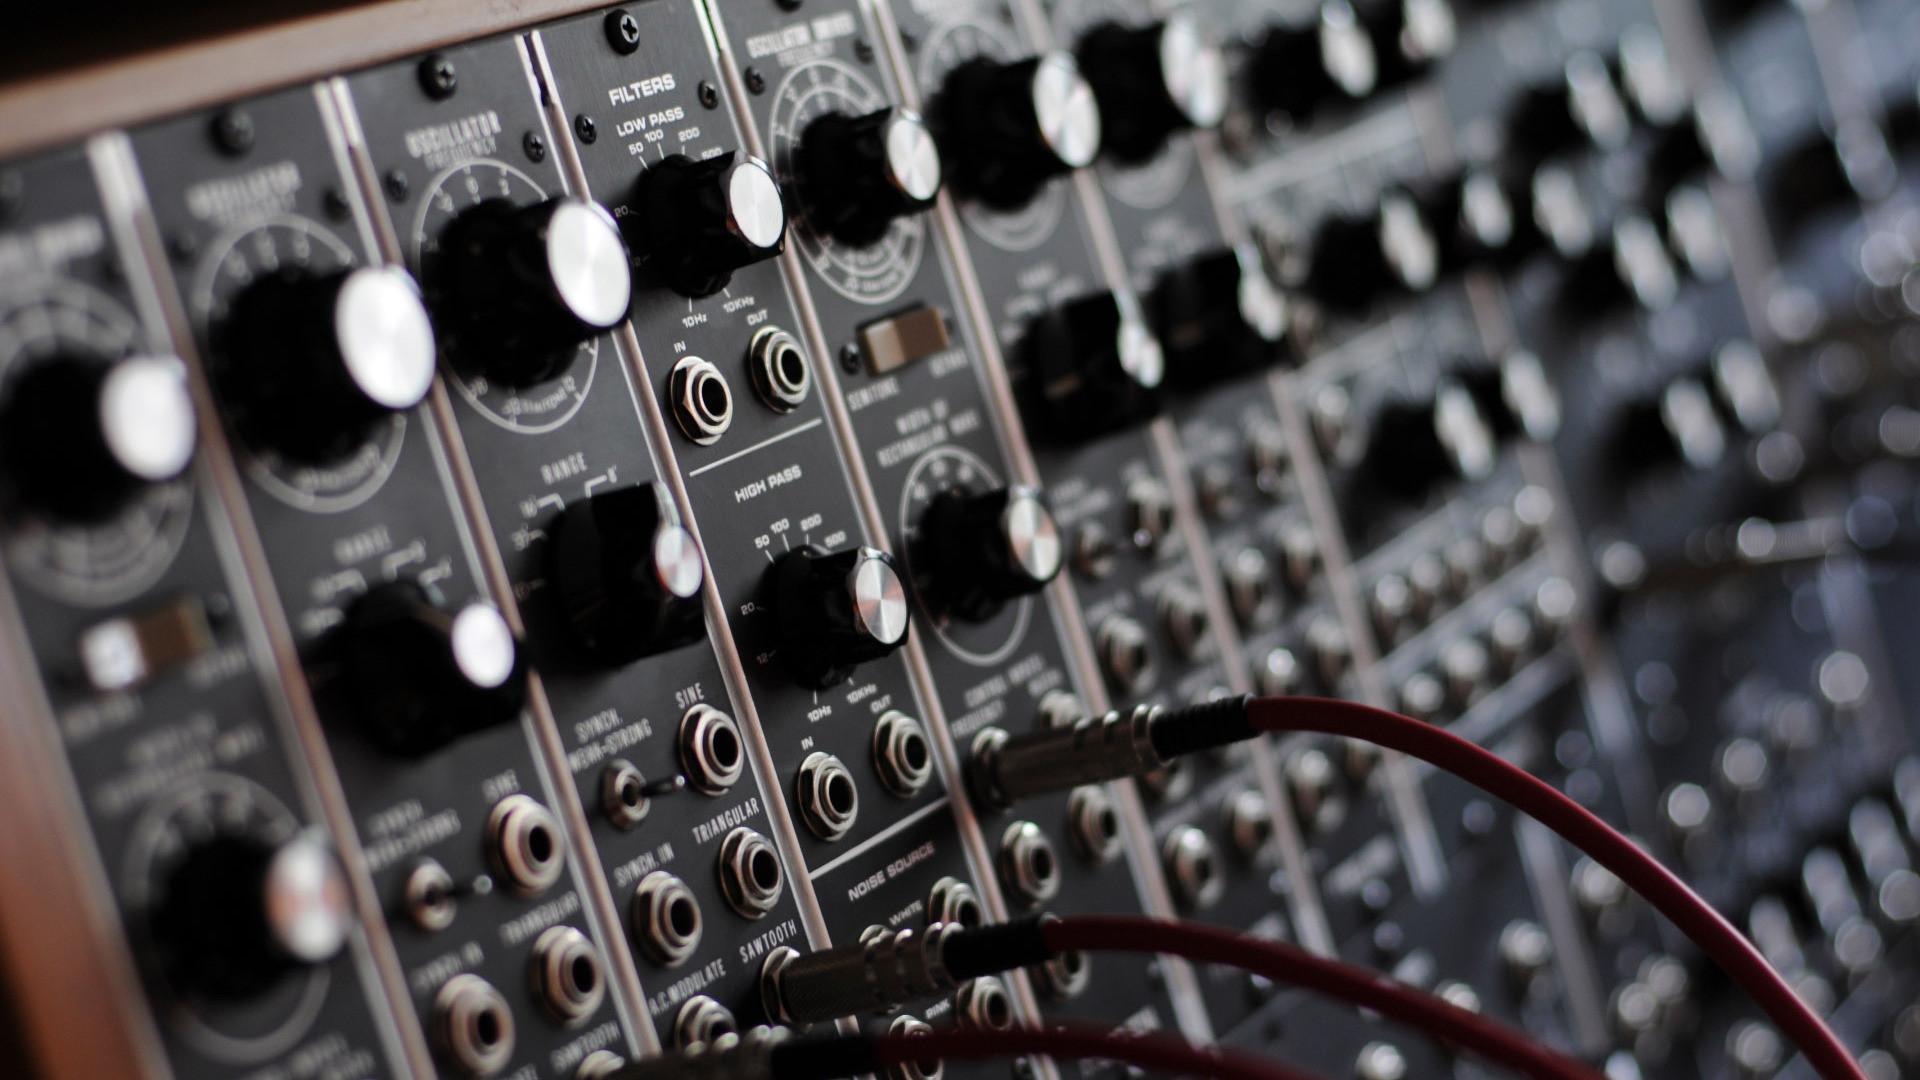 A Moog modular synthesizer.